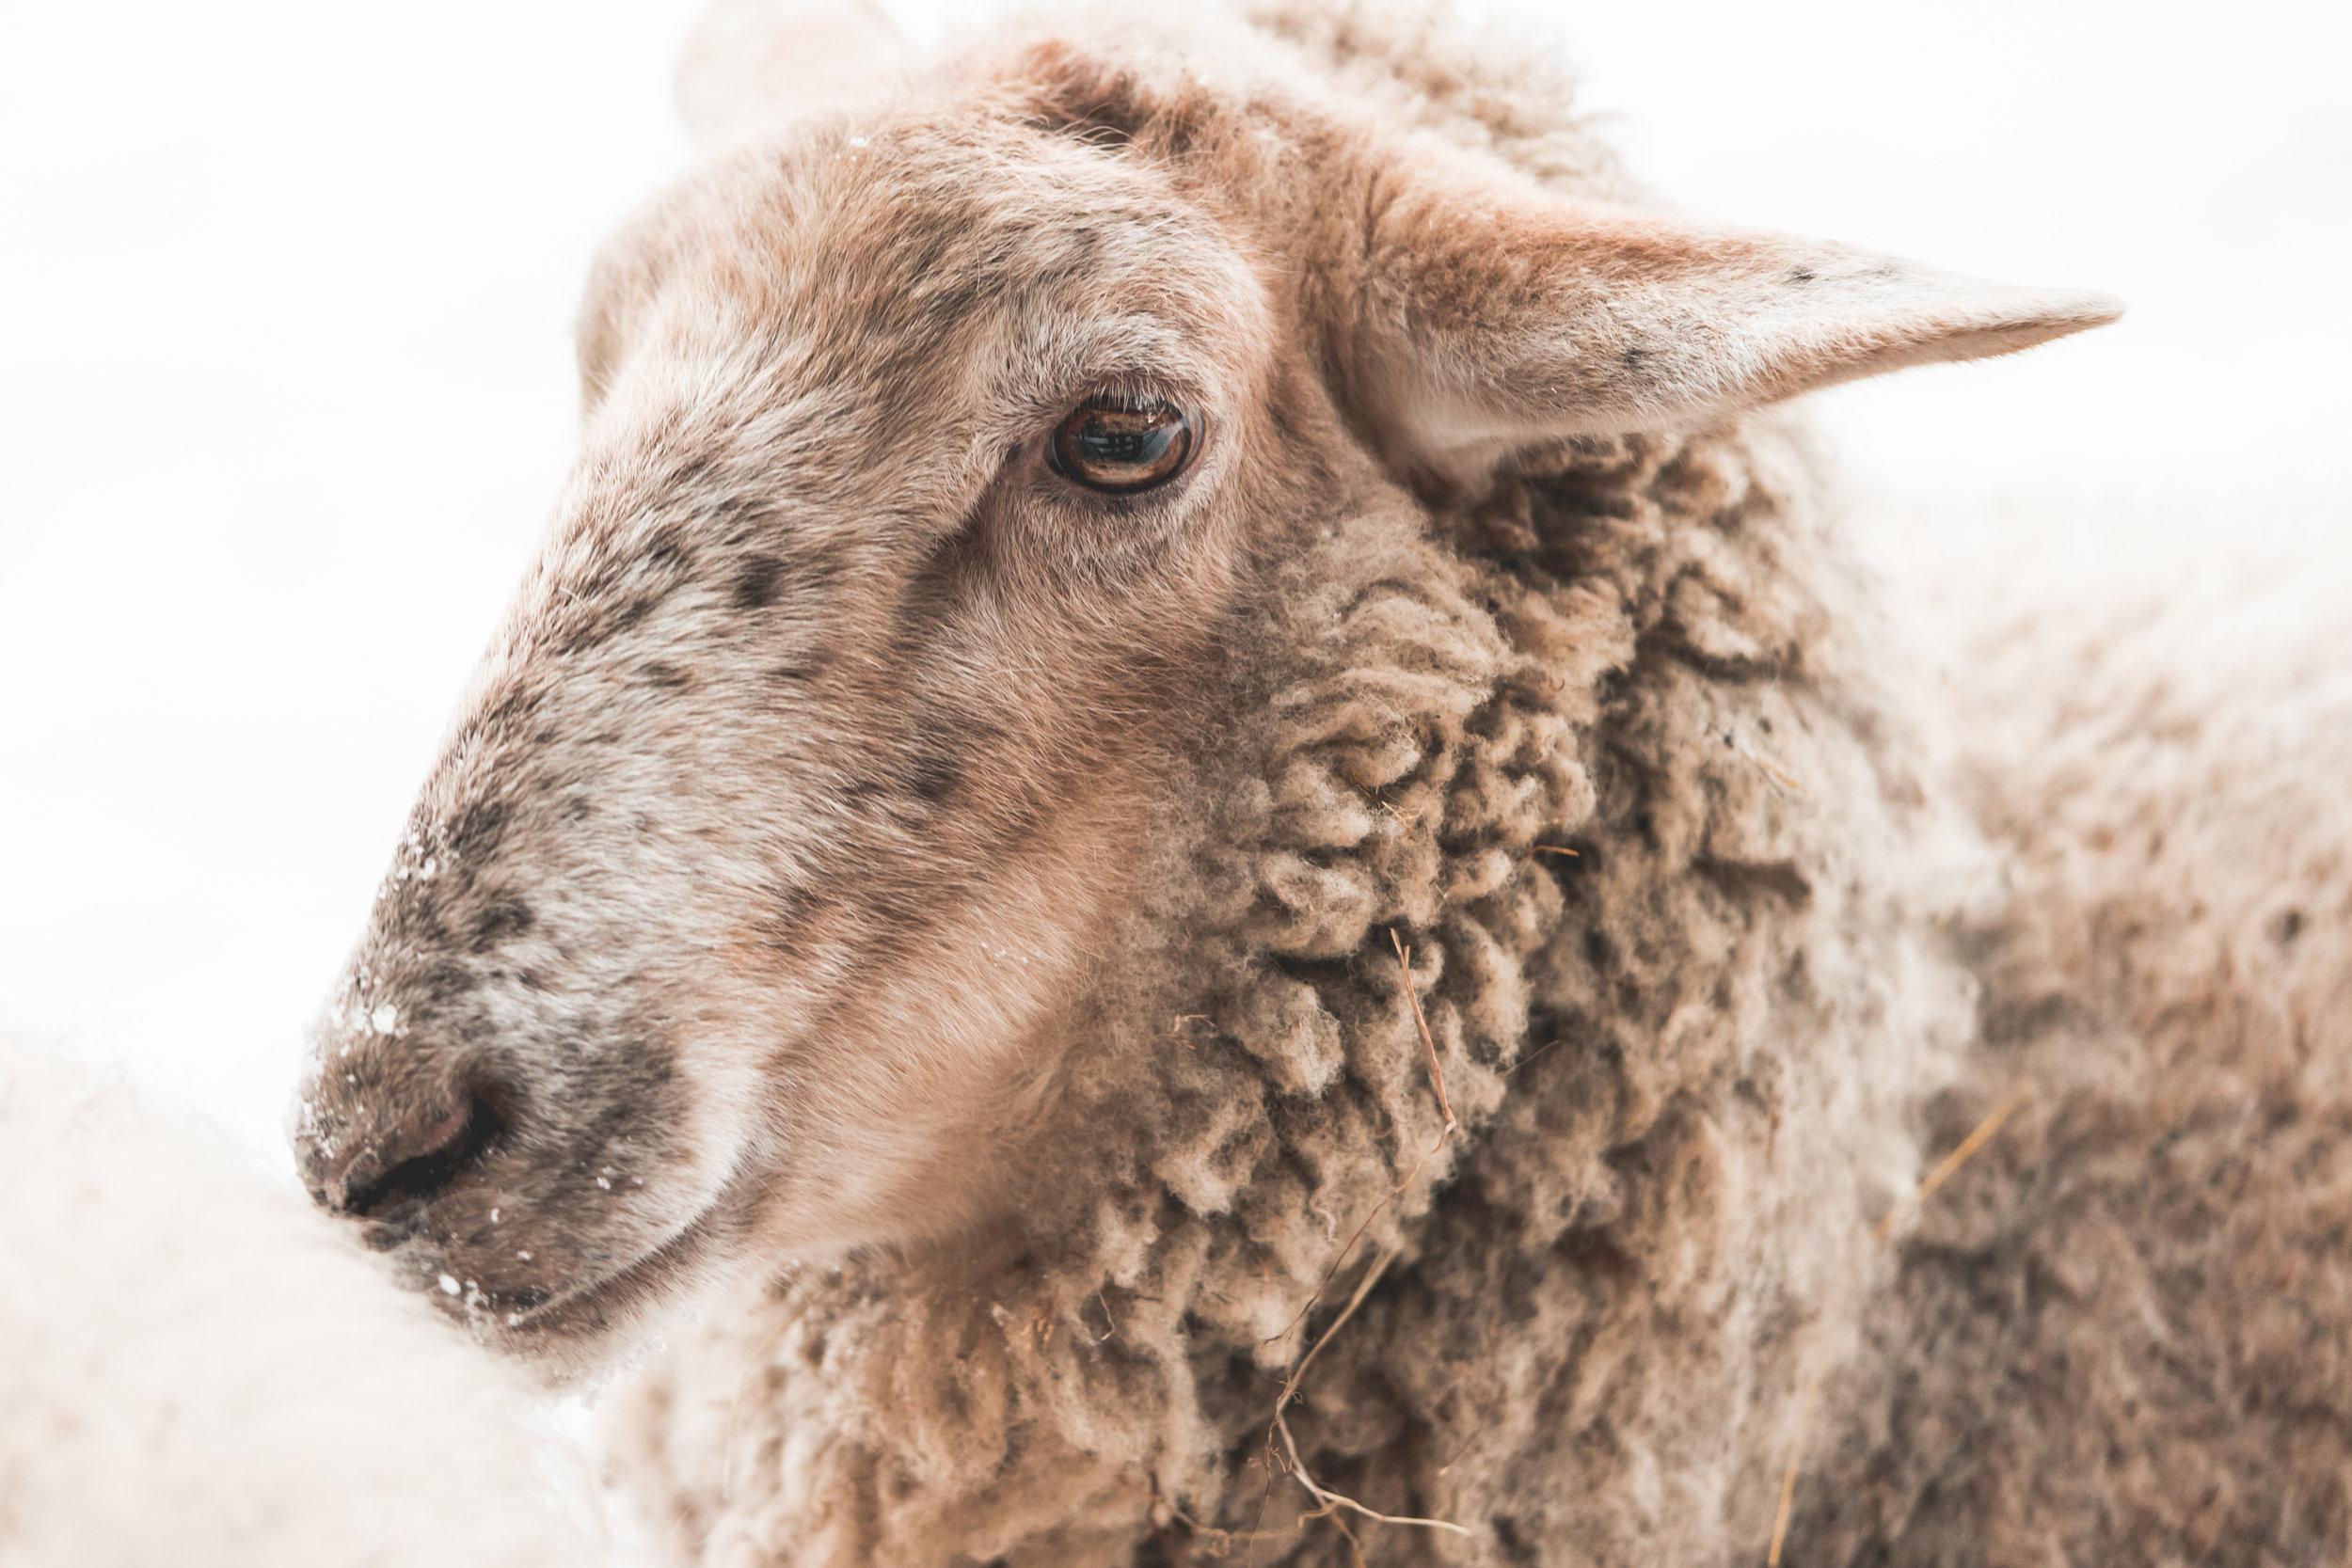 portrait-of-sheep-in-winter-picjumbo-com.jpg